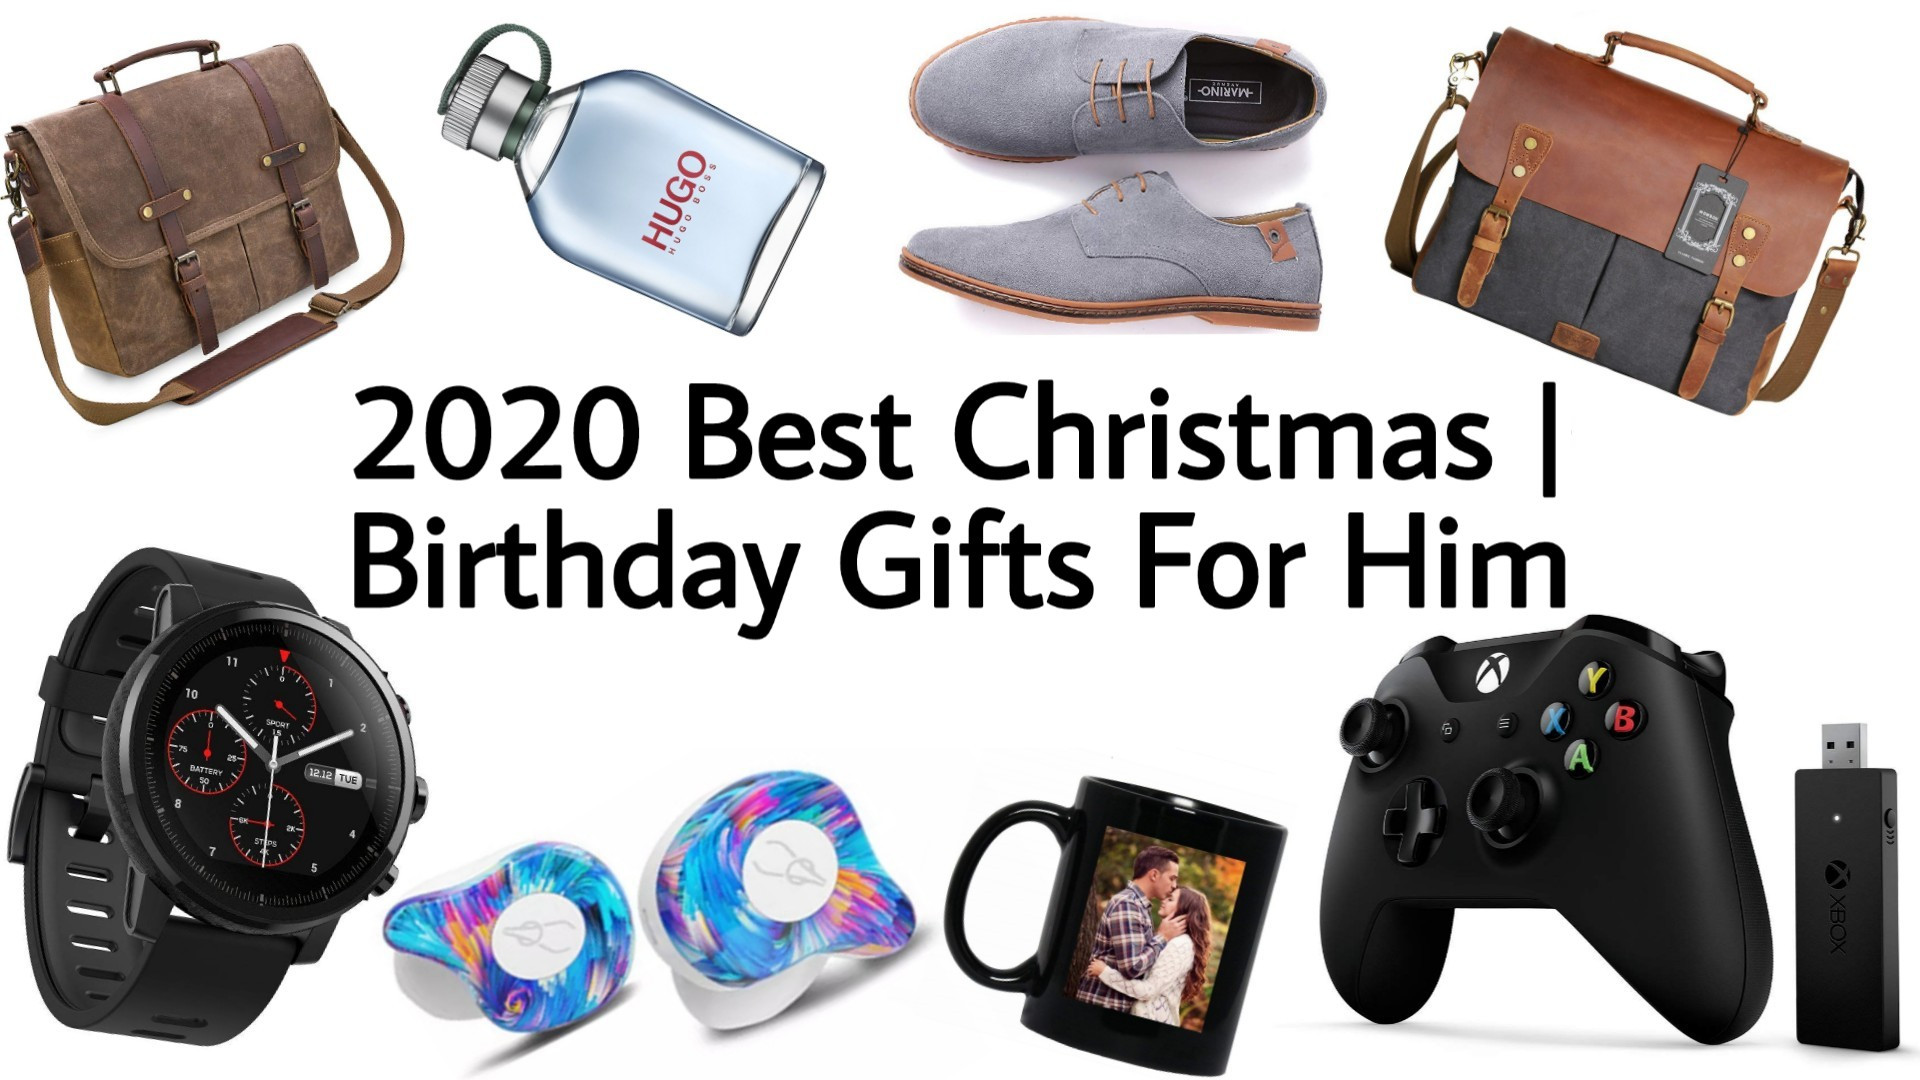 Boyfriend Christmas Gift Ideas 2020  Top Christmas Gifts for Him Boys Boyfriend Husband 2020